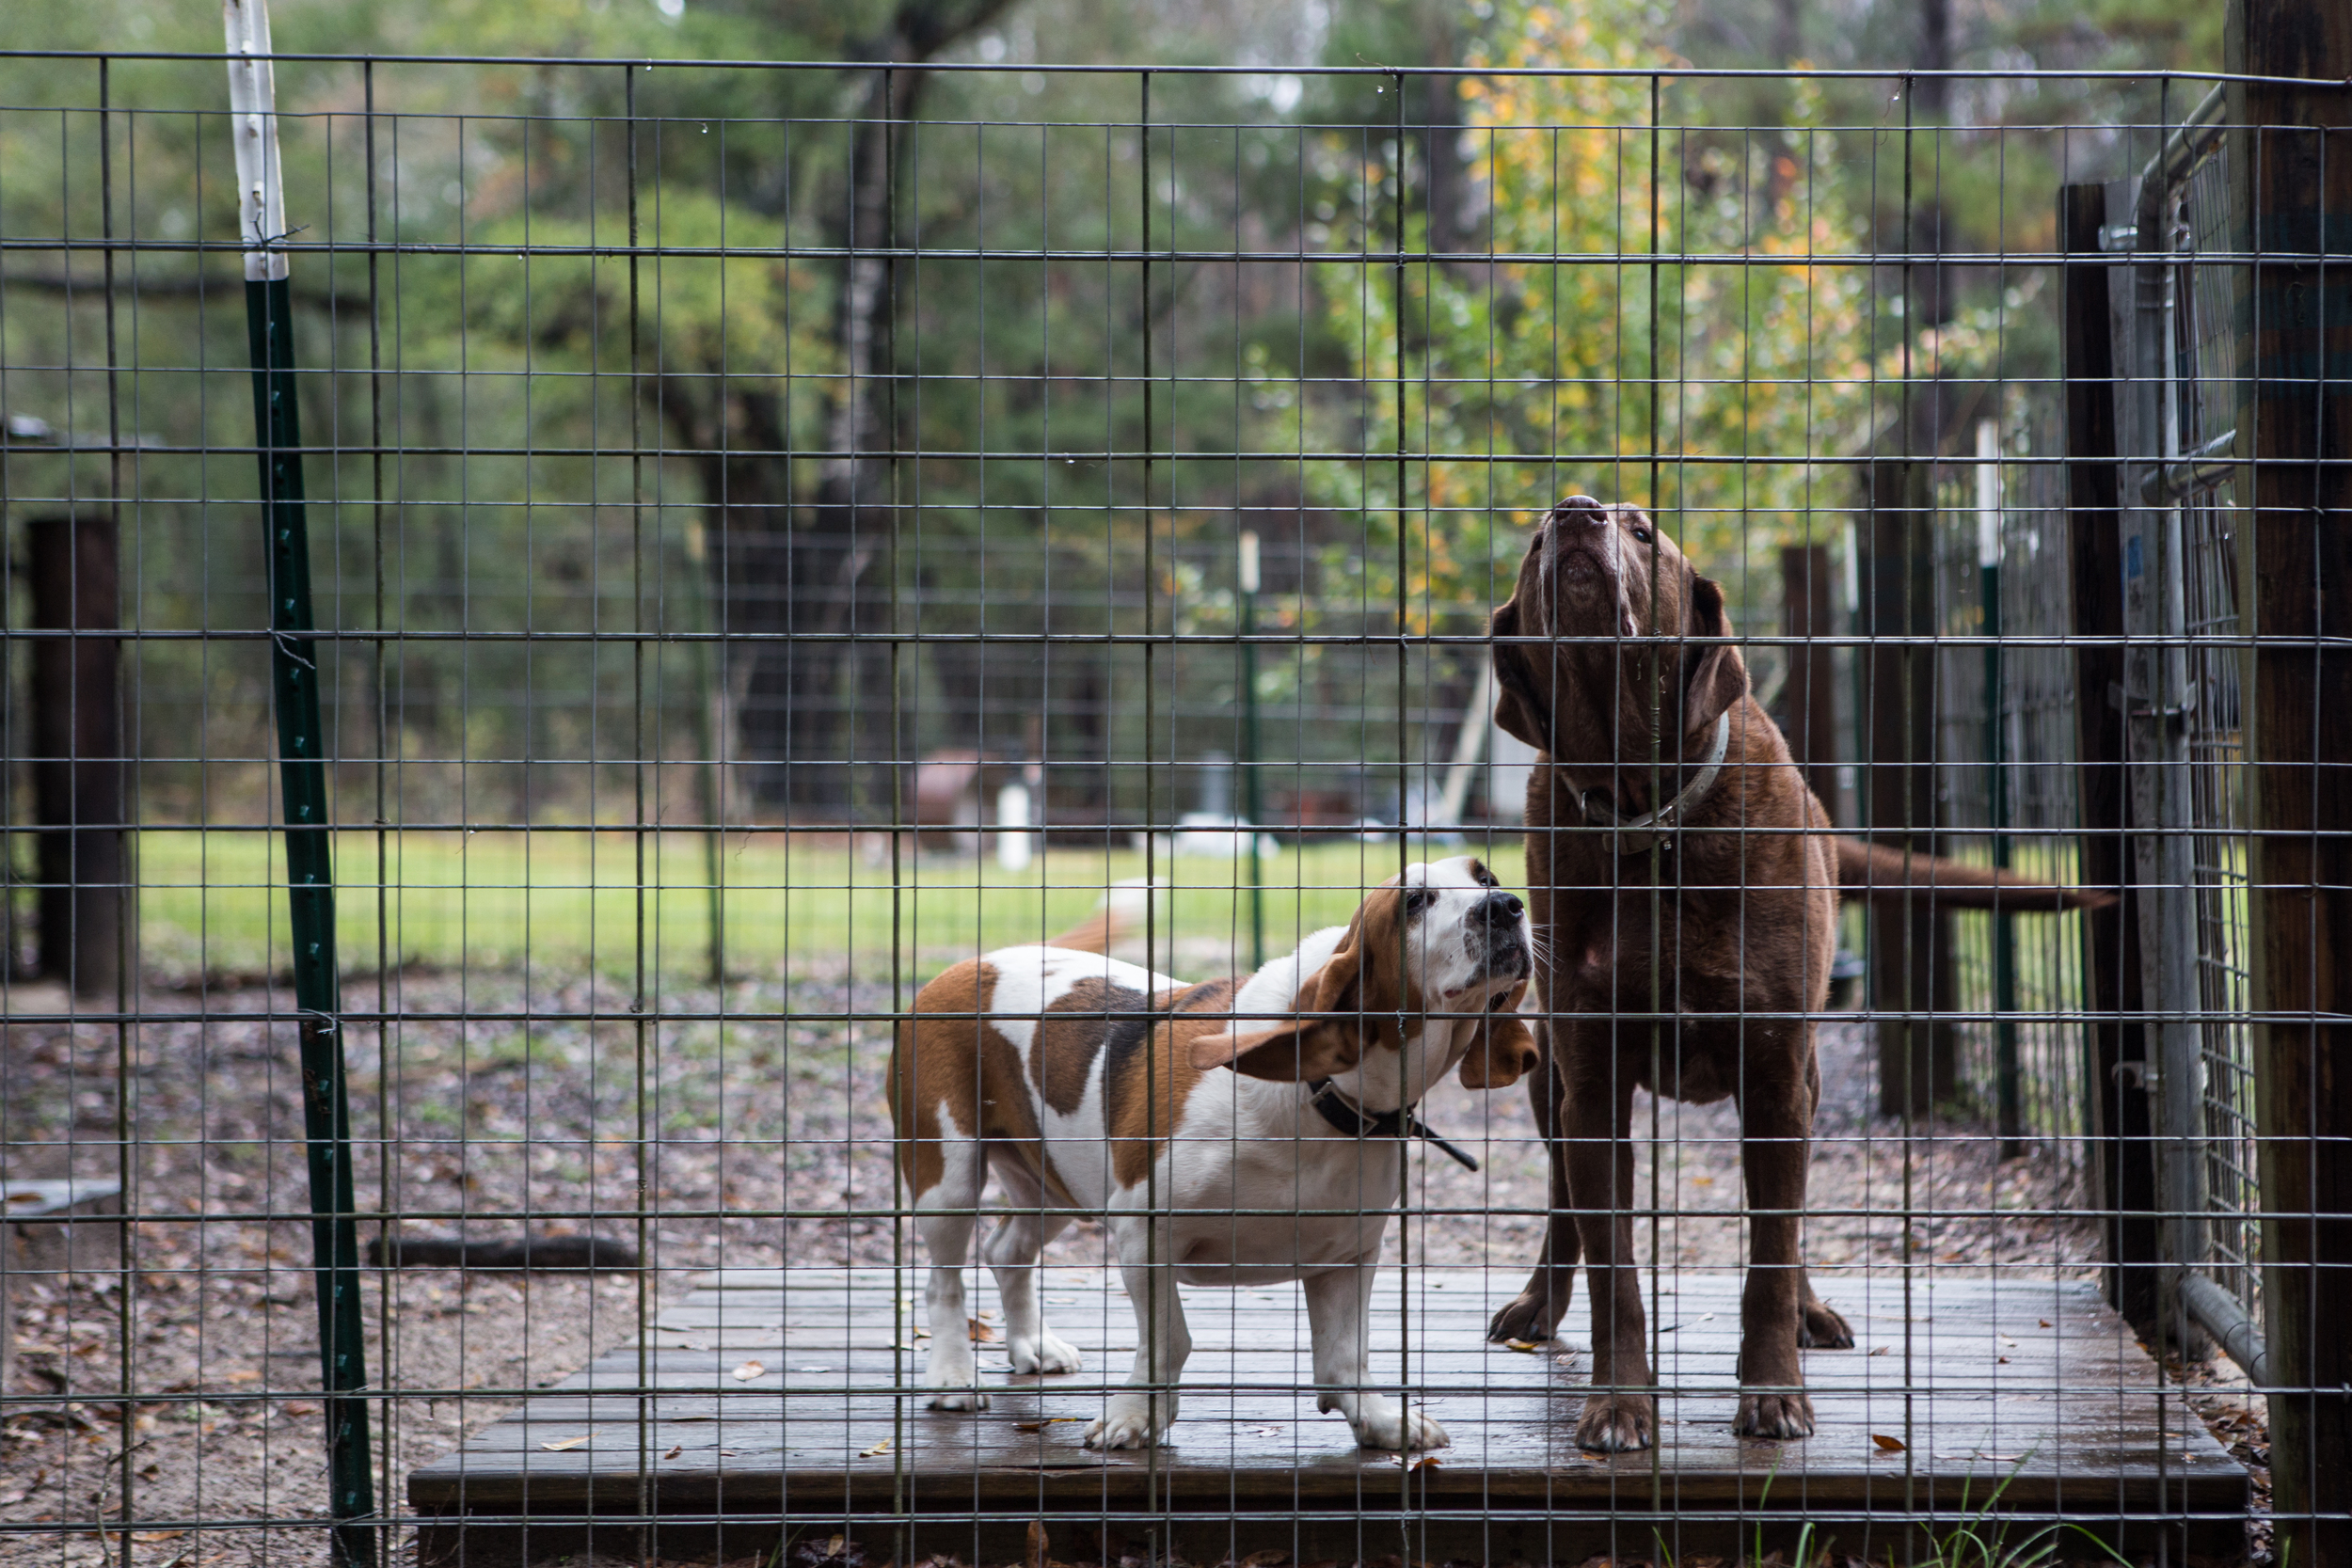 Farm dogs doing their farm dog thing.